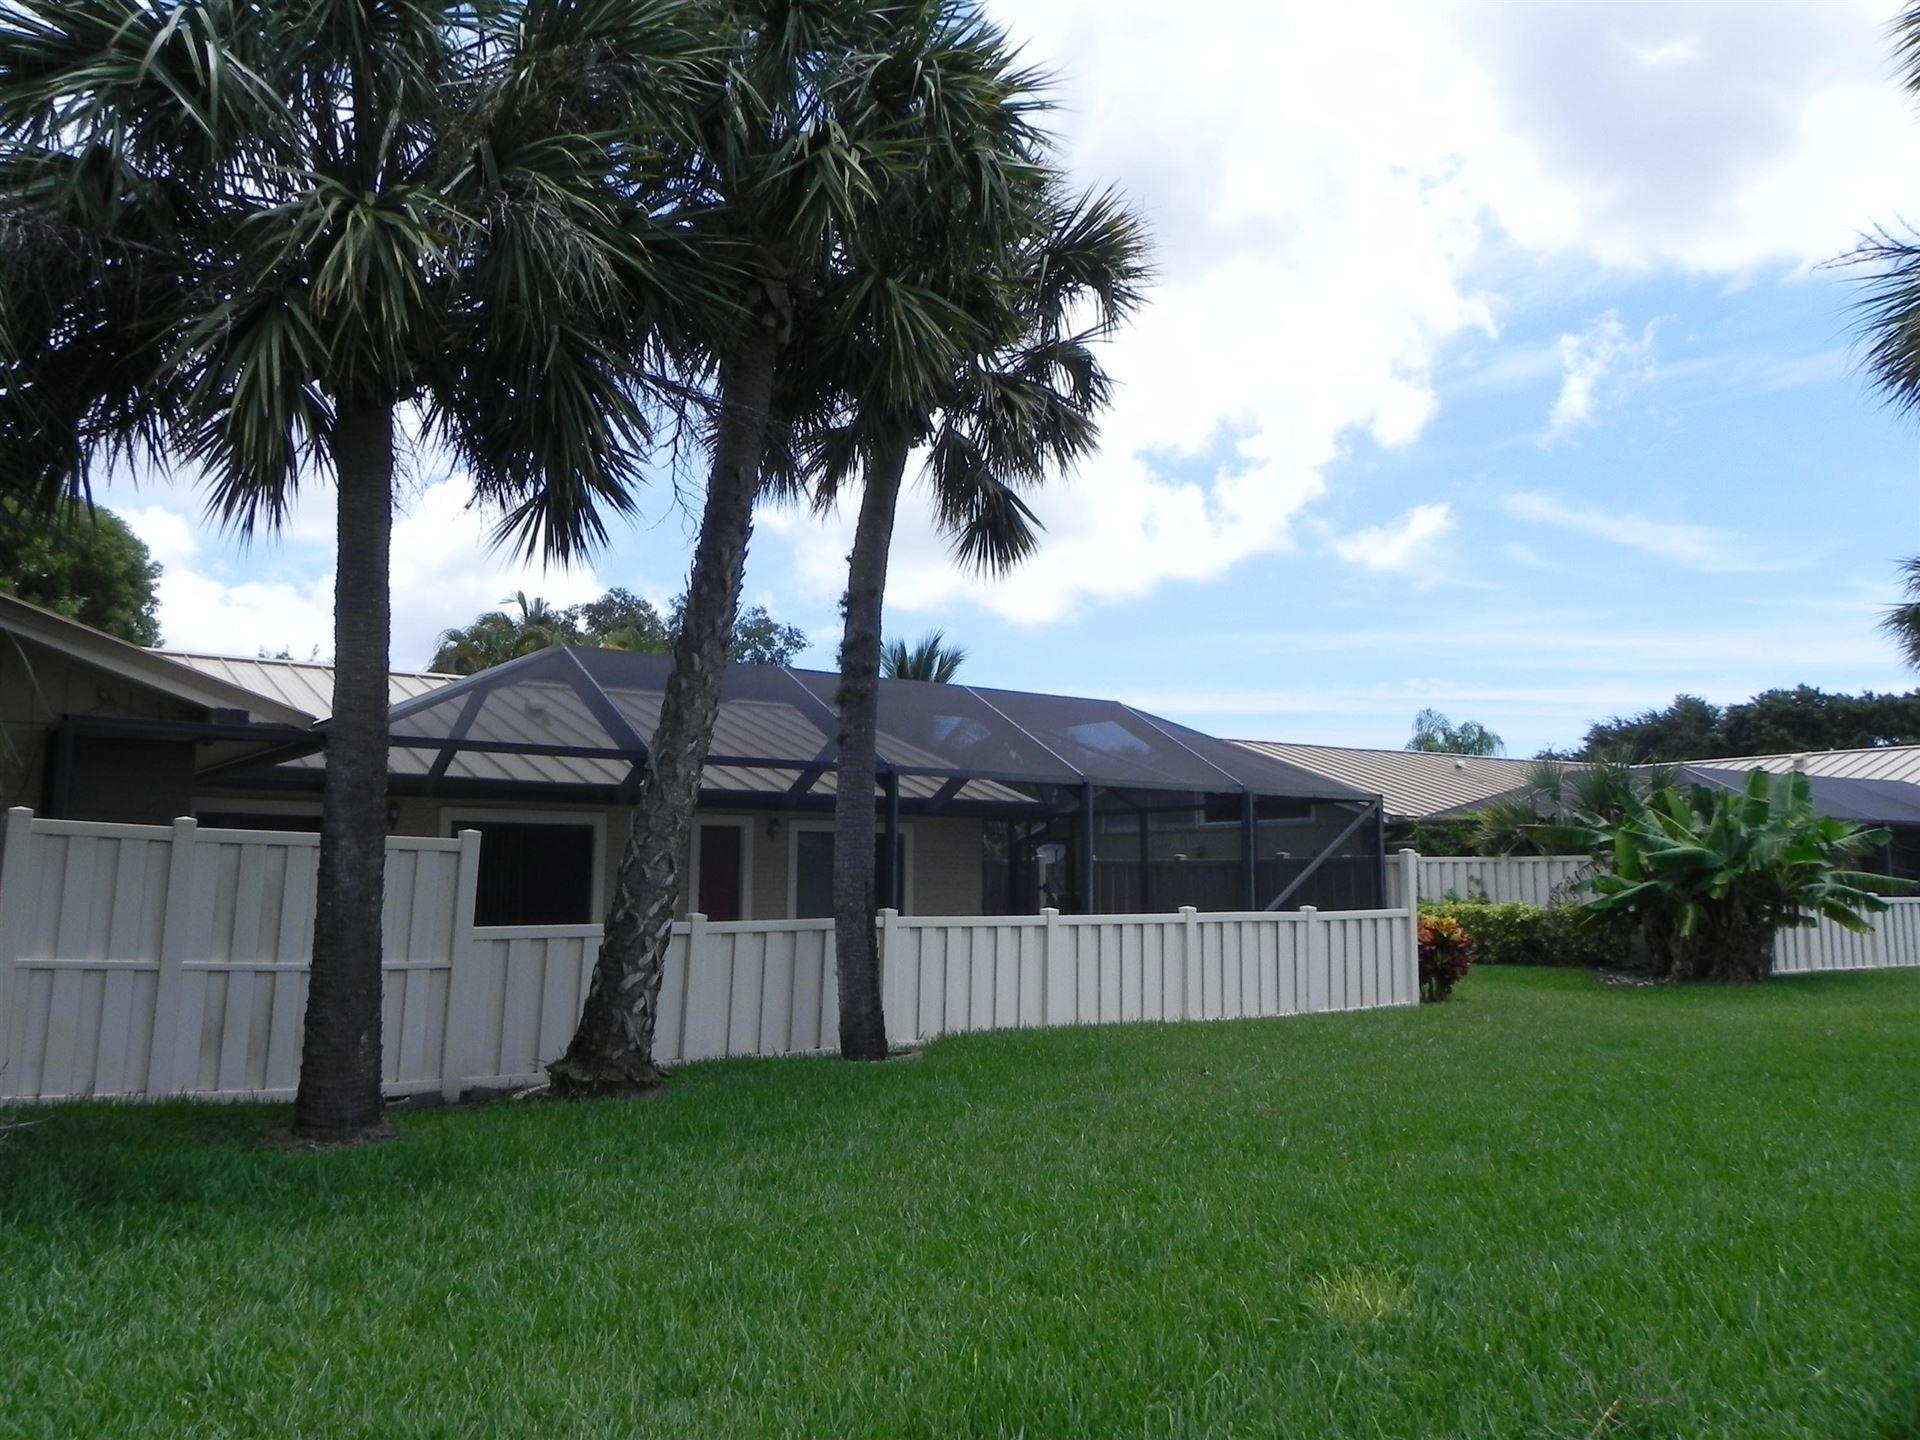 Photo of 5927 Golden Eagle Circle #Lane 2, Palm Beach Gardens, FL 33418 (MLS # RX-10685242)